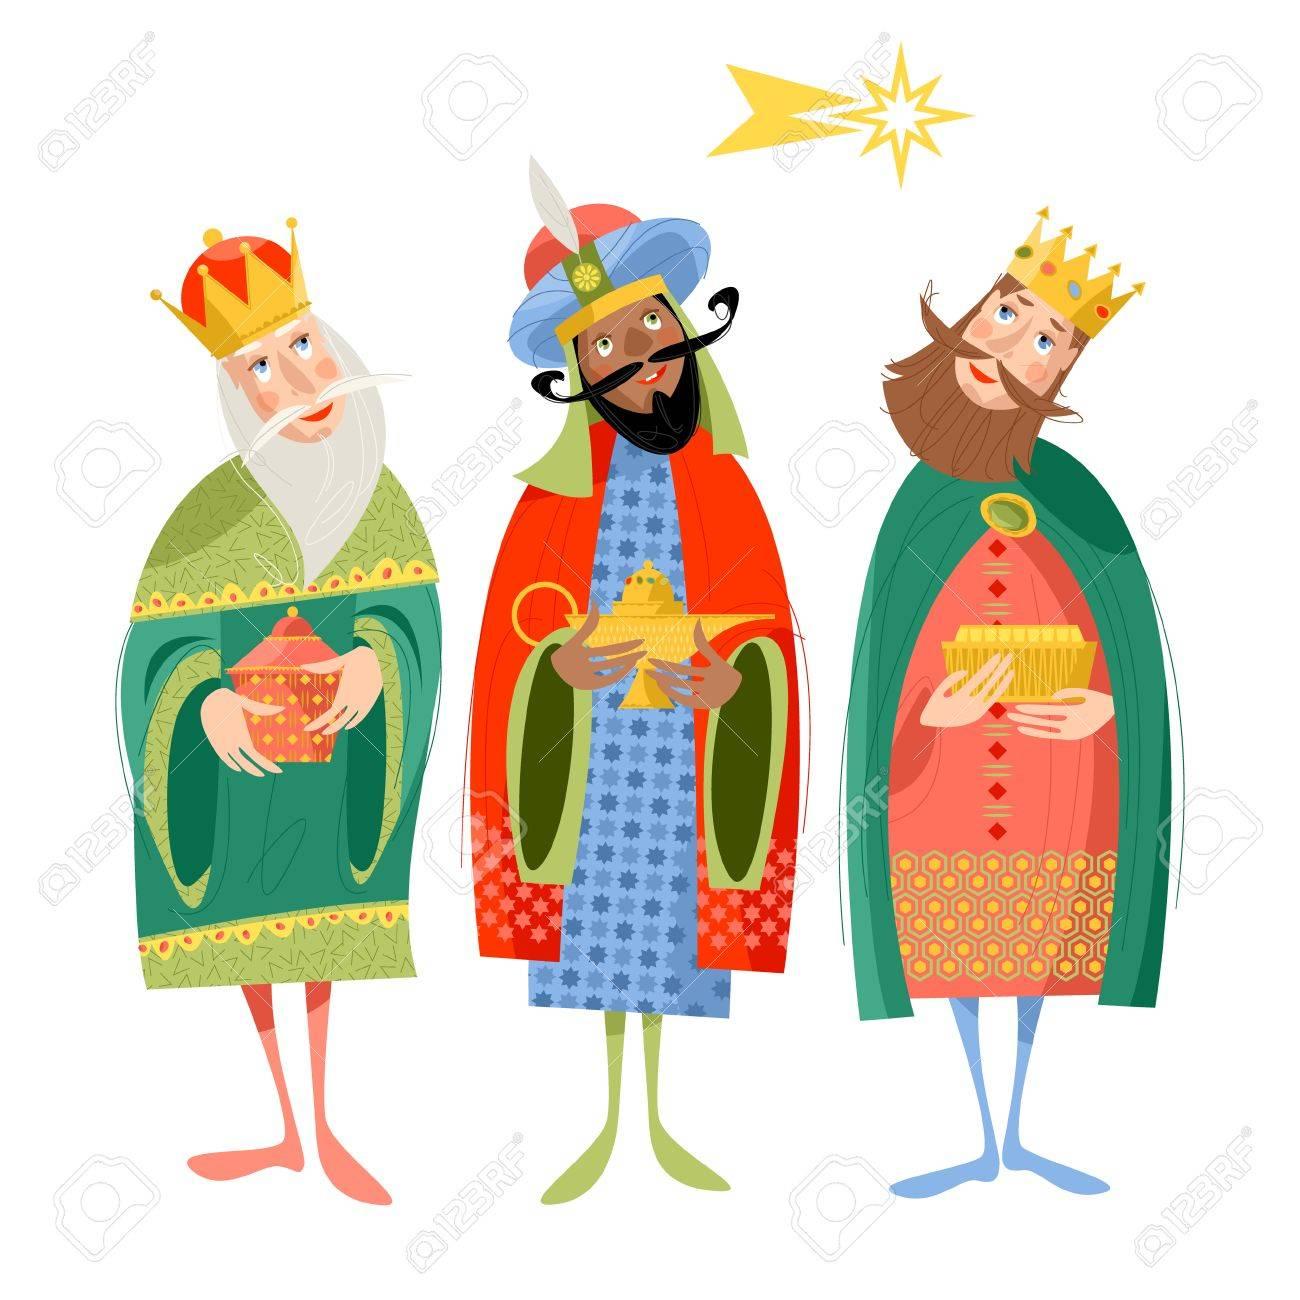 Three biblical Kings: Caspar, Melchior and Balthazar. Three wise men. Vector illustration. - 87625521